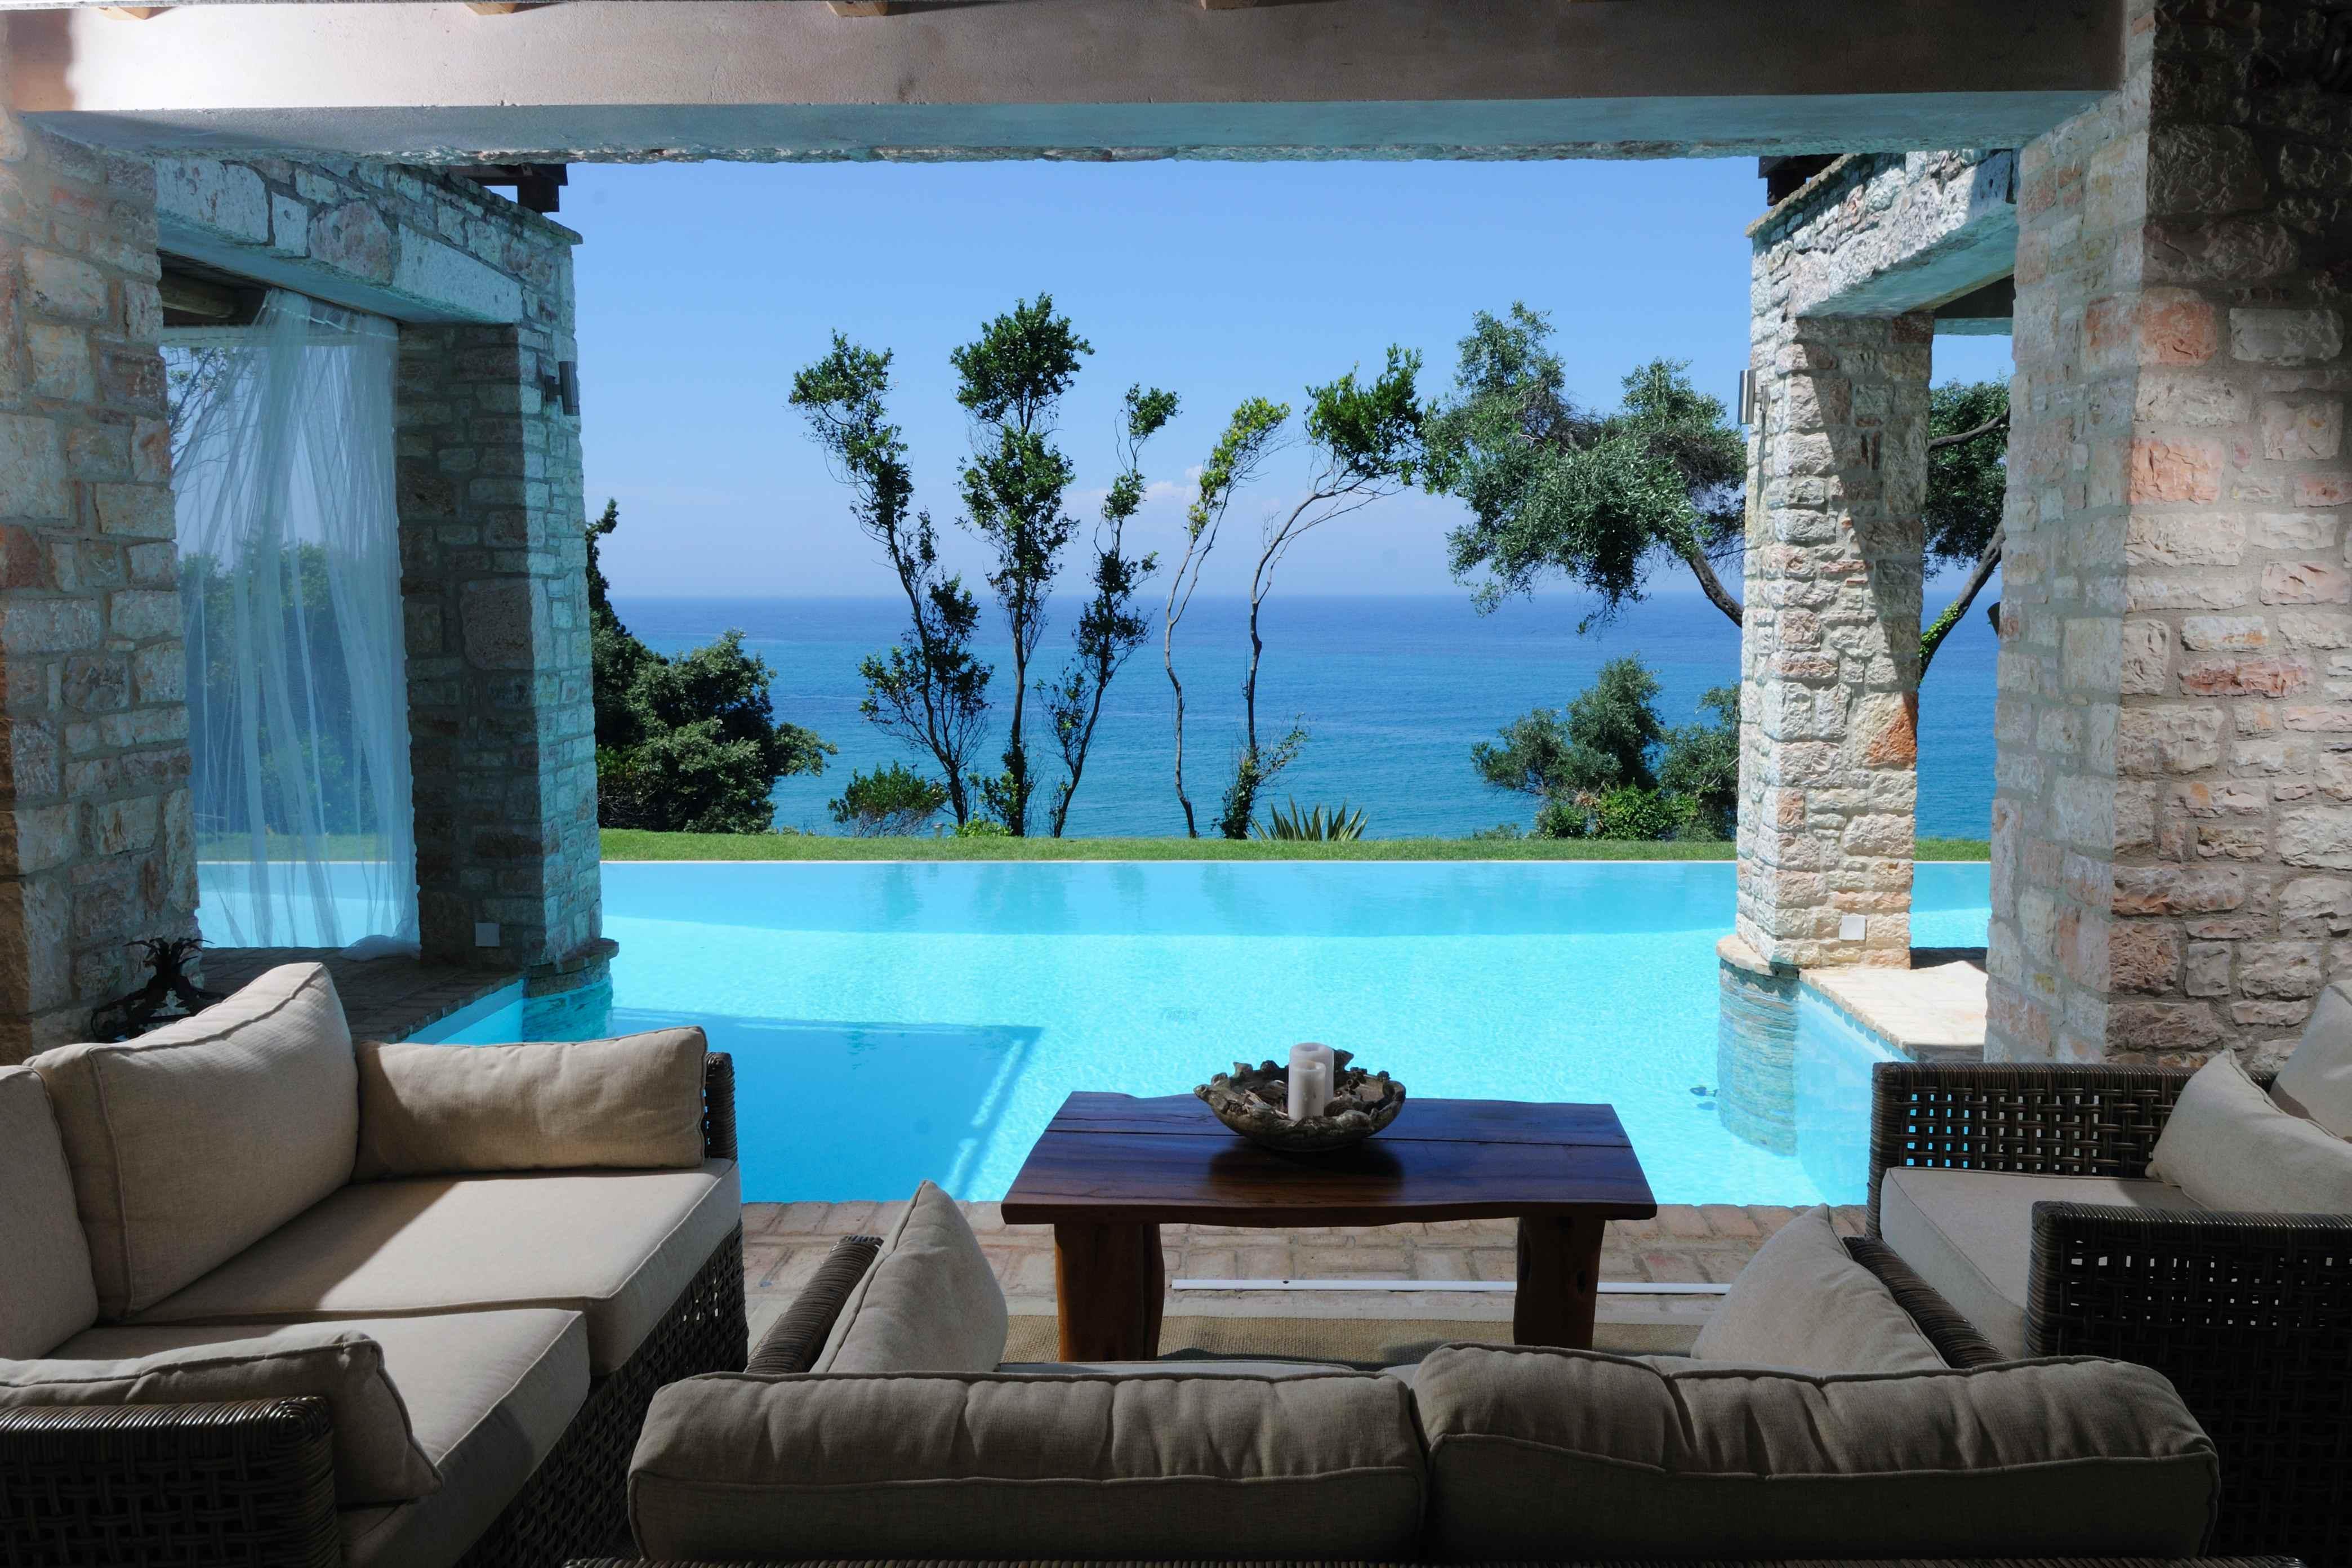 Ausblick - Korfu Villa Steilküste, Agios Spiridon, Korfu, Griechenland